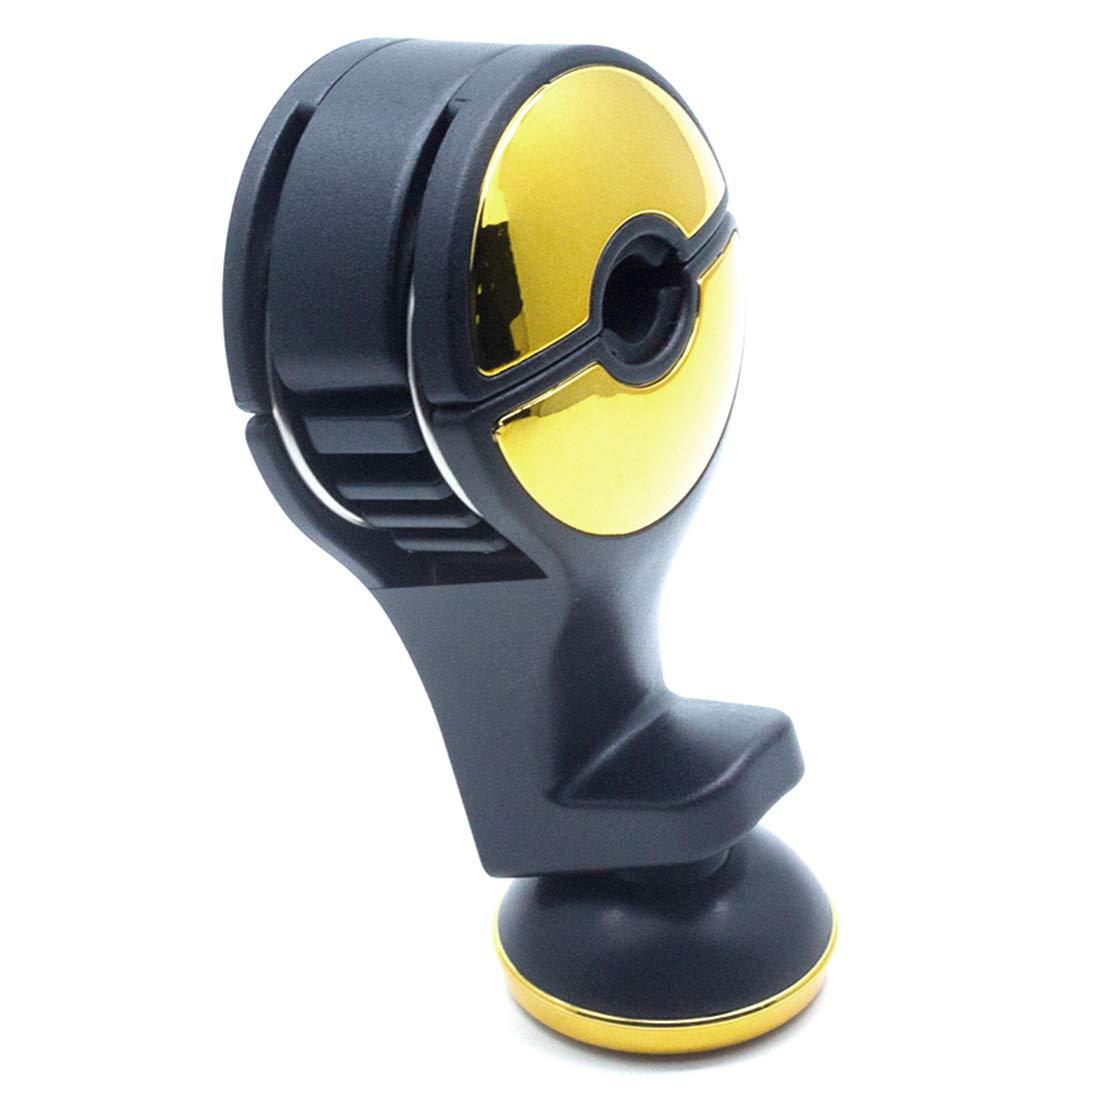 Universal Phone Holder Car Backseat Hanger Hook Organizer Compatible with All Smartphones GPS AUTUT 2PCS Car Hook Mobile Phone Holder,Magnetic Headrest Mount Silver